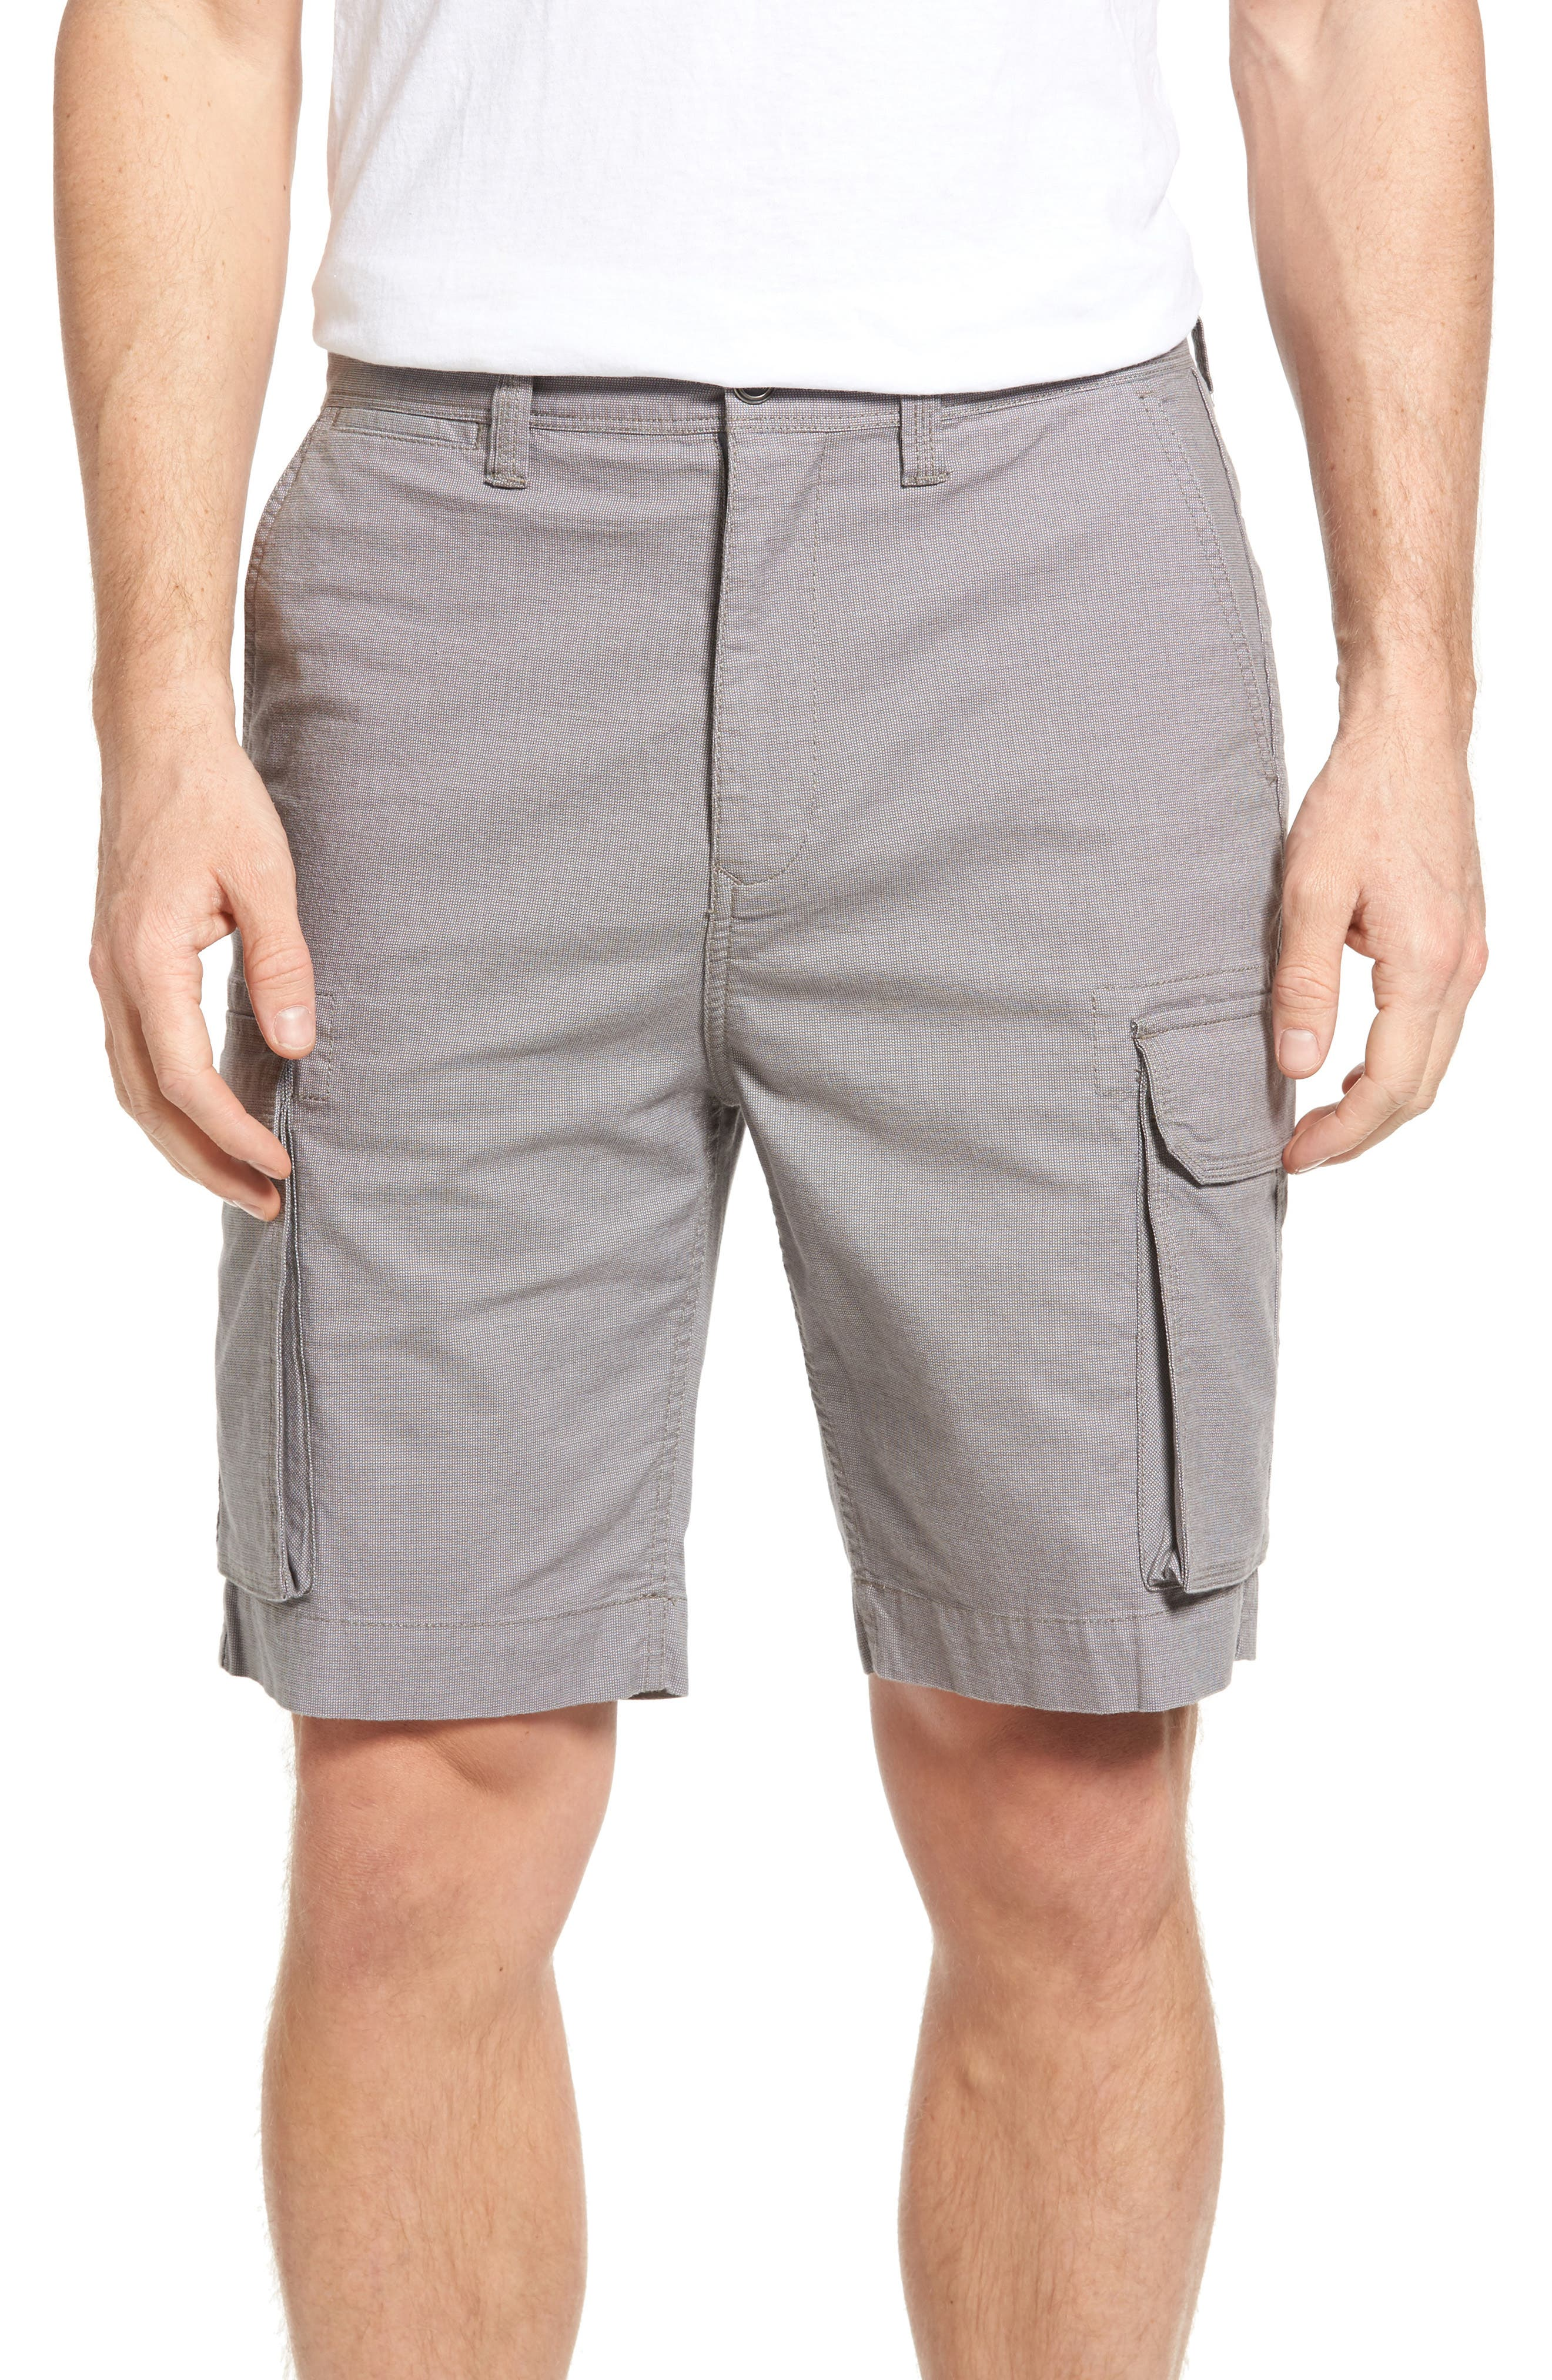 Ludstone Cargo Shorts,                             Main thumbnail 1, color,                             053